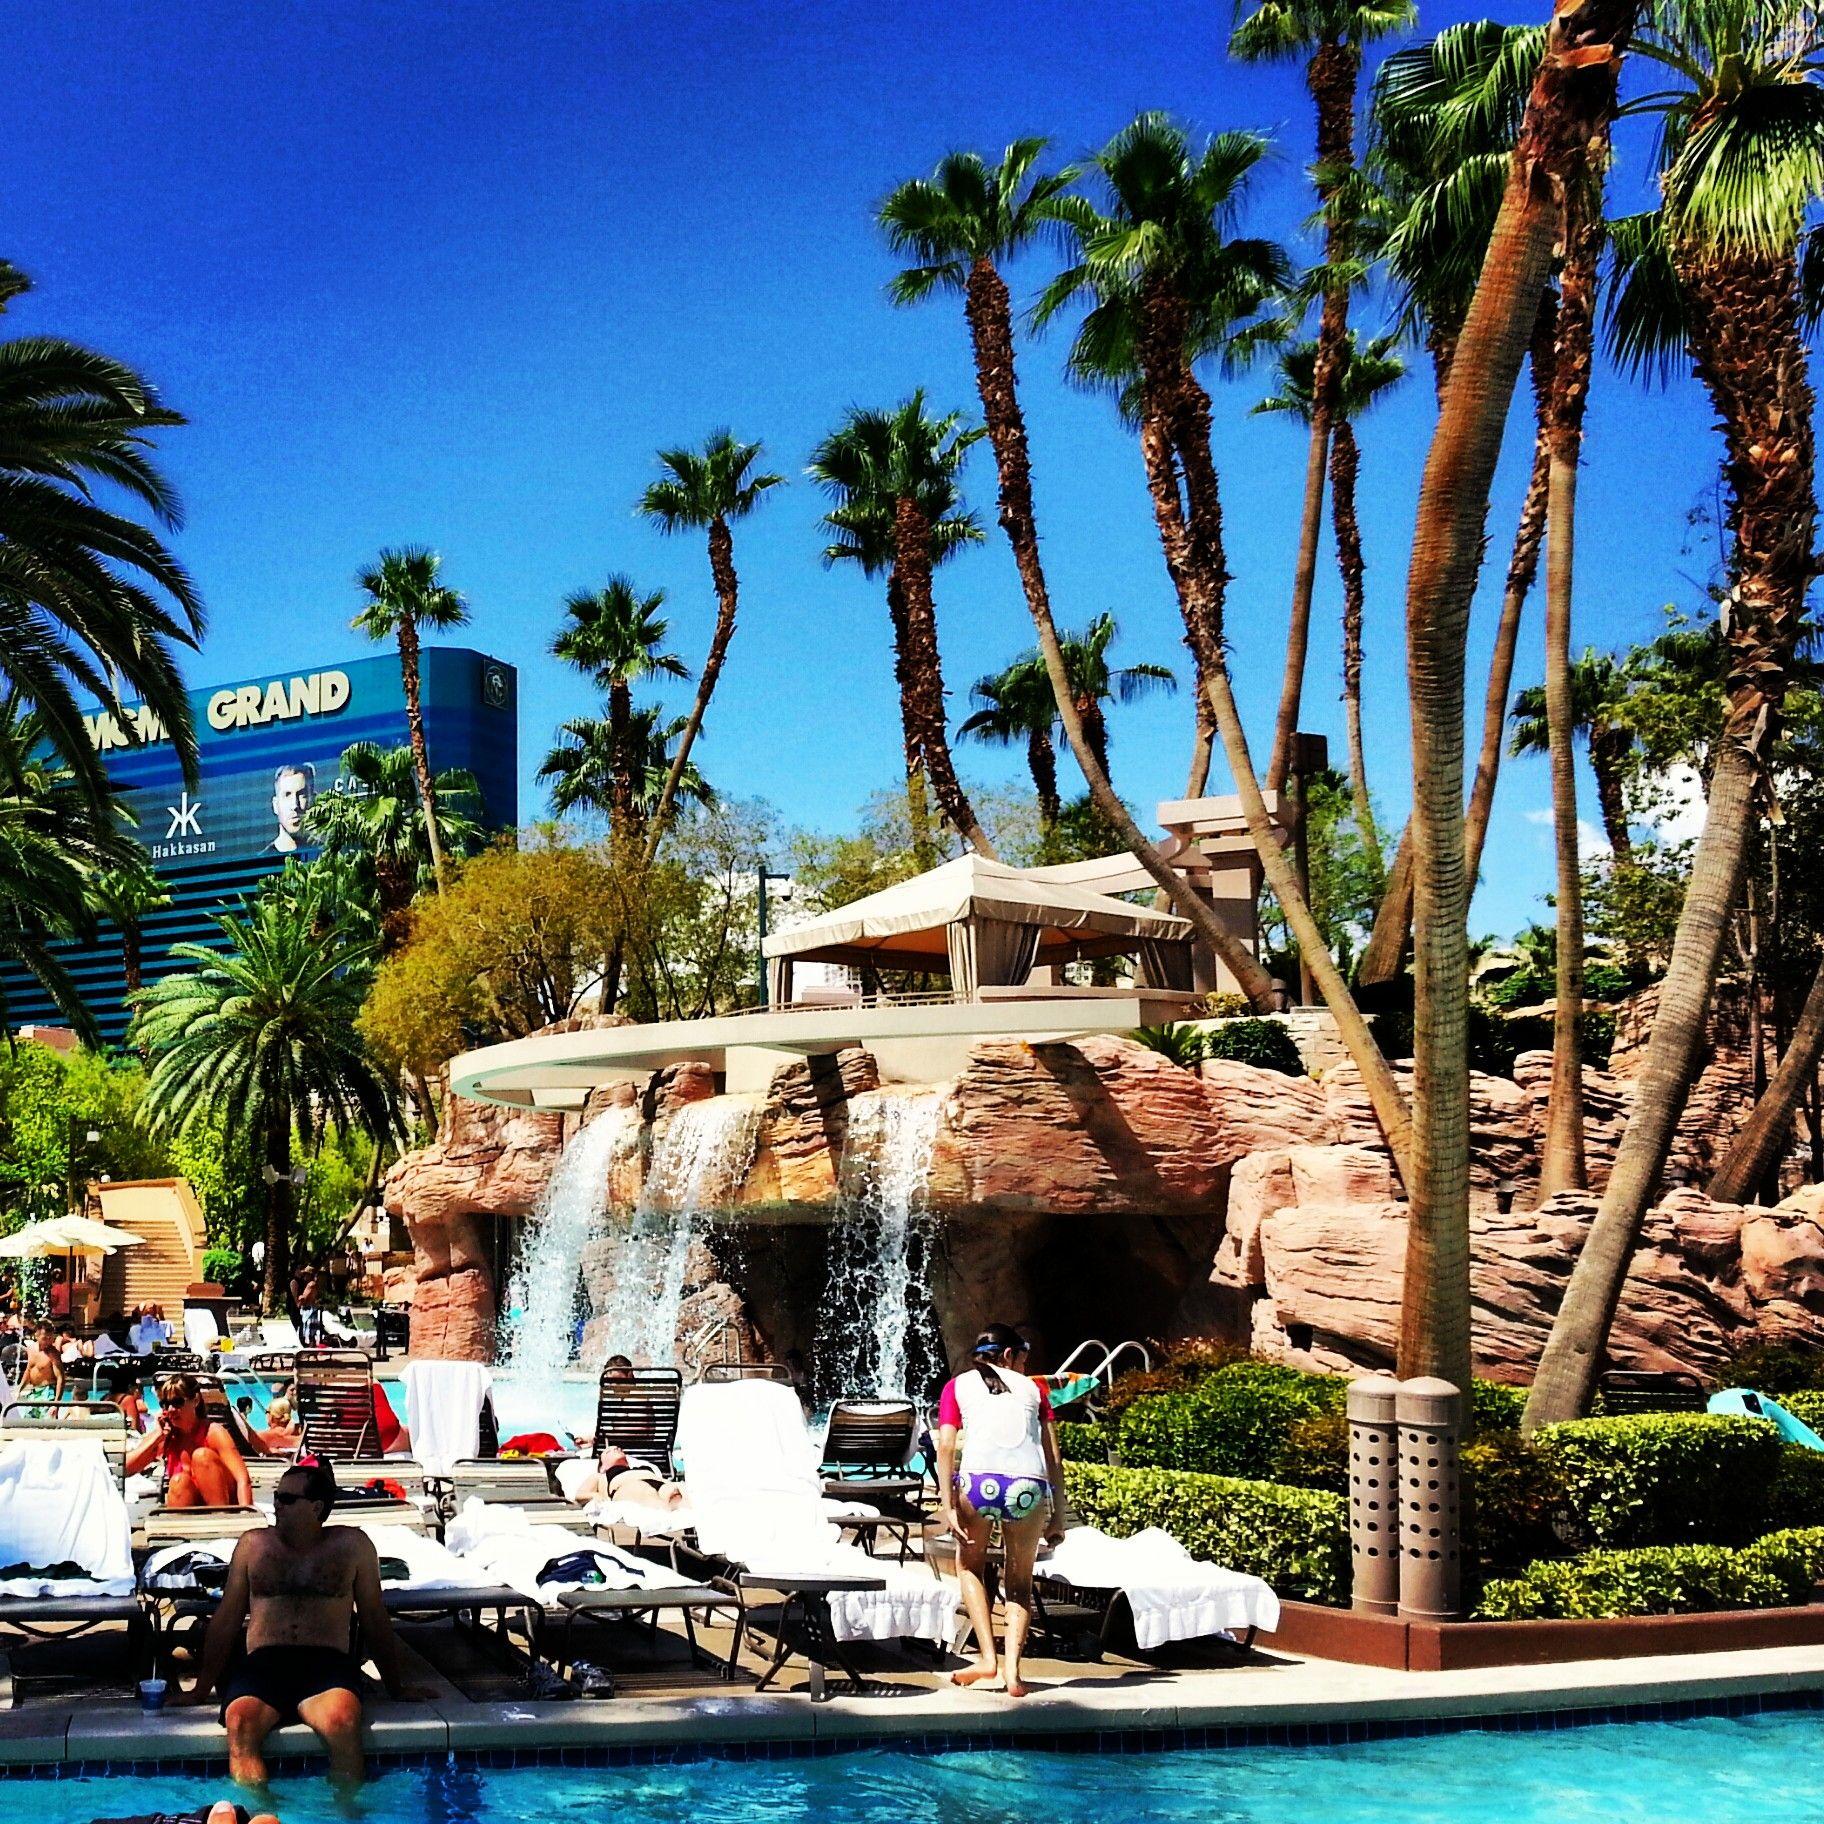 Grand Pool Complex Summer Destinations Vacation Pool